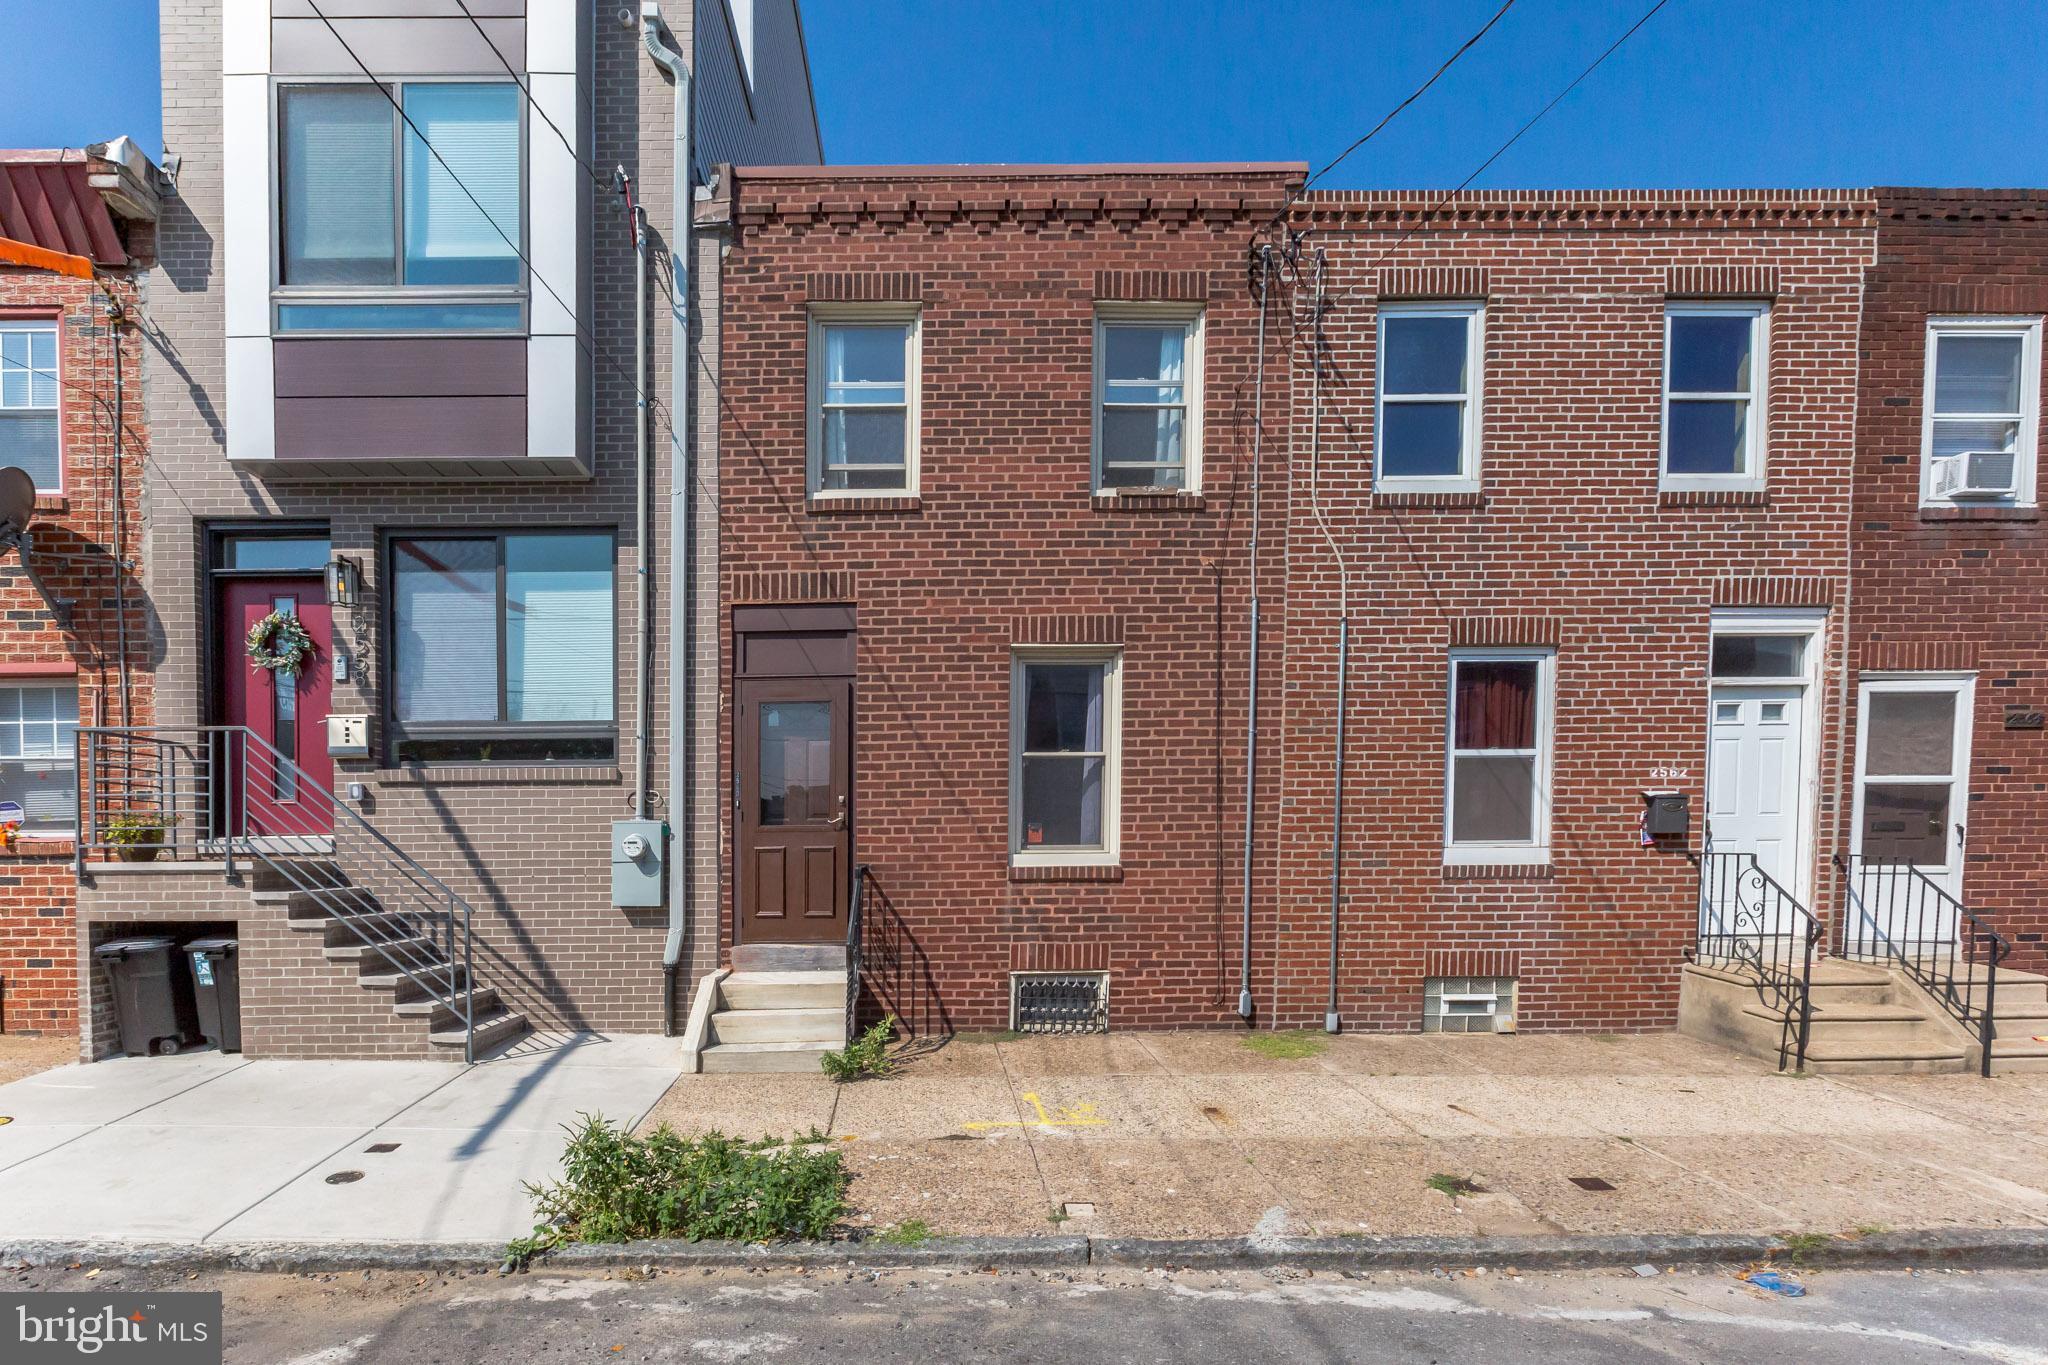 2560 TULIP STREET, PHILADELPHIA, PA 19125